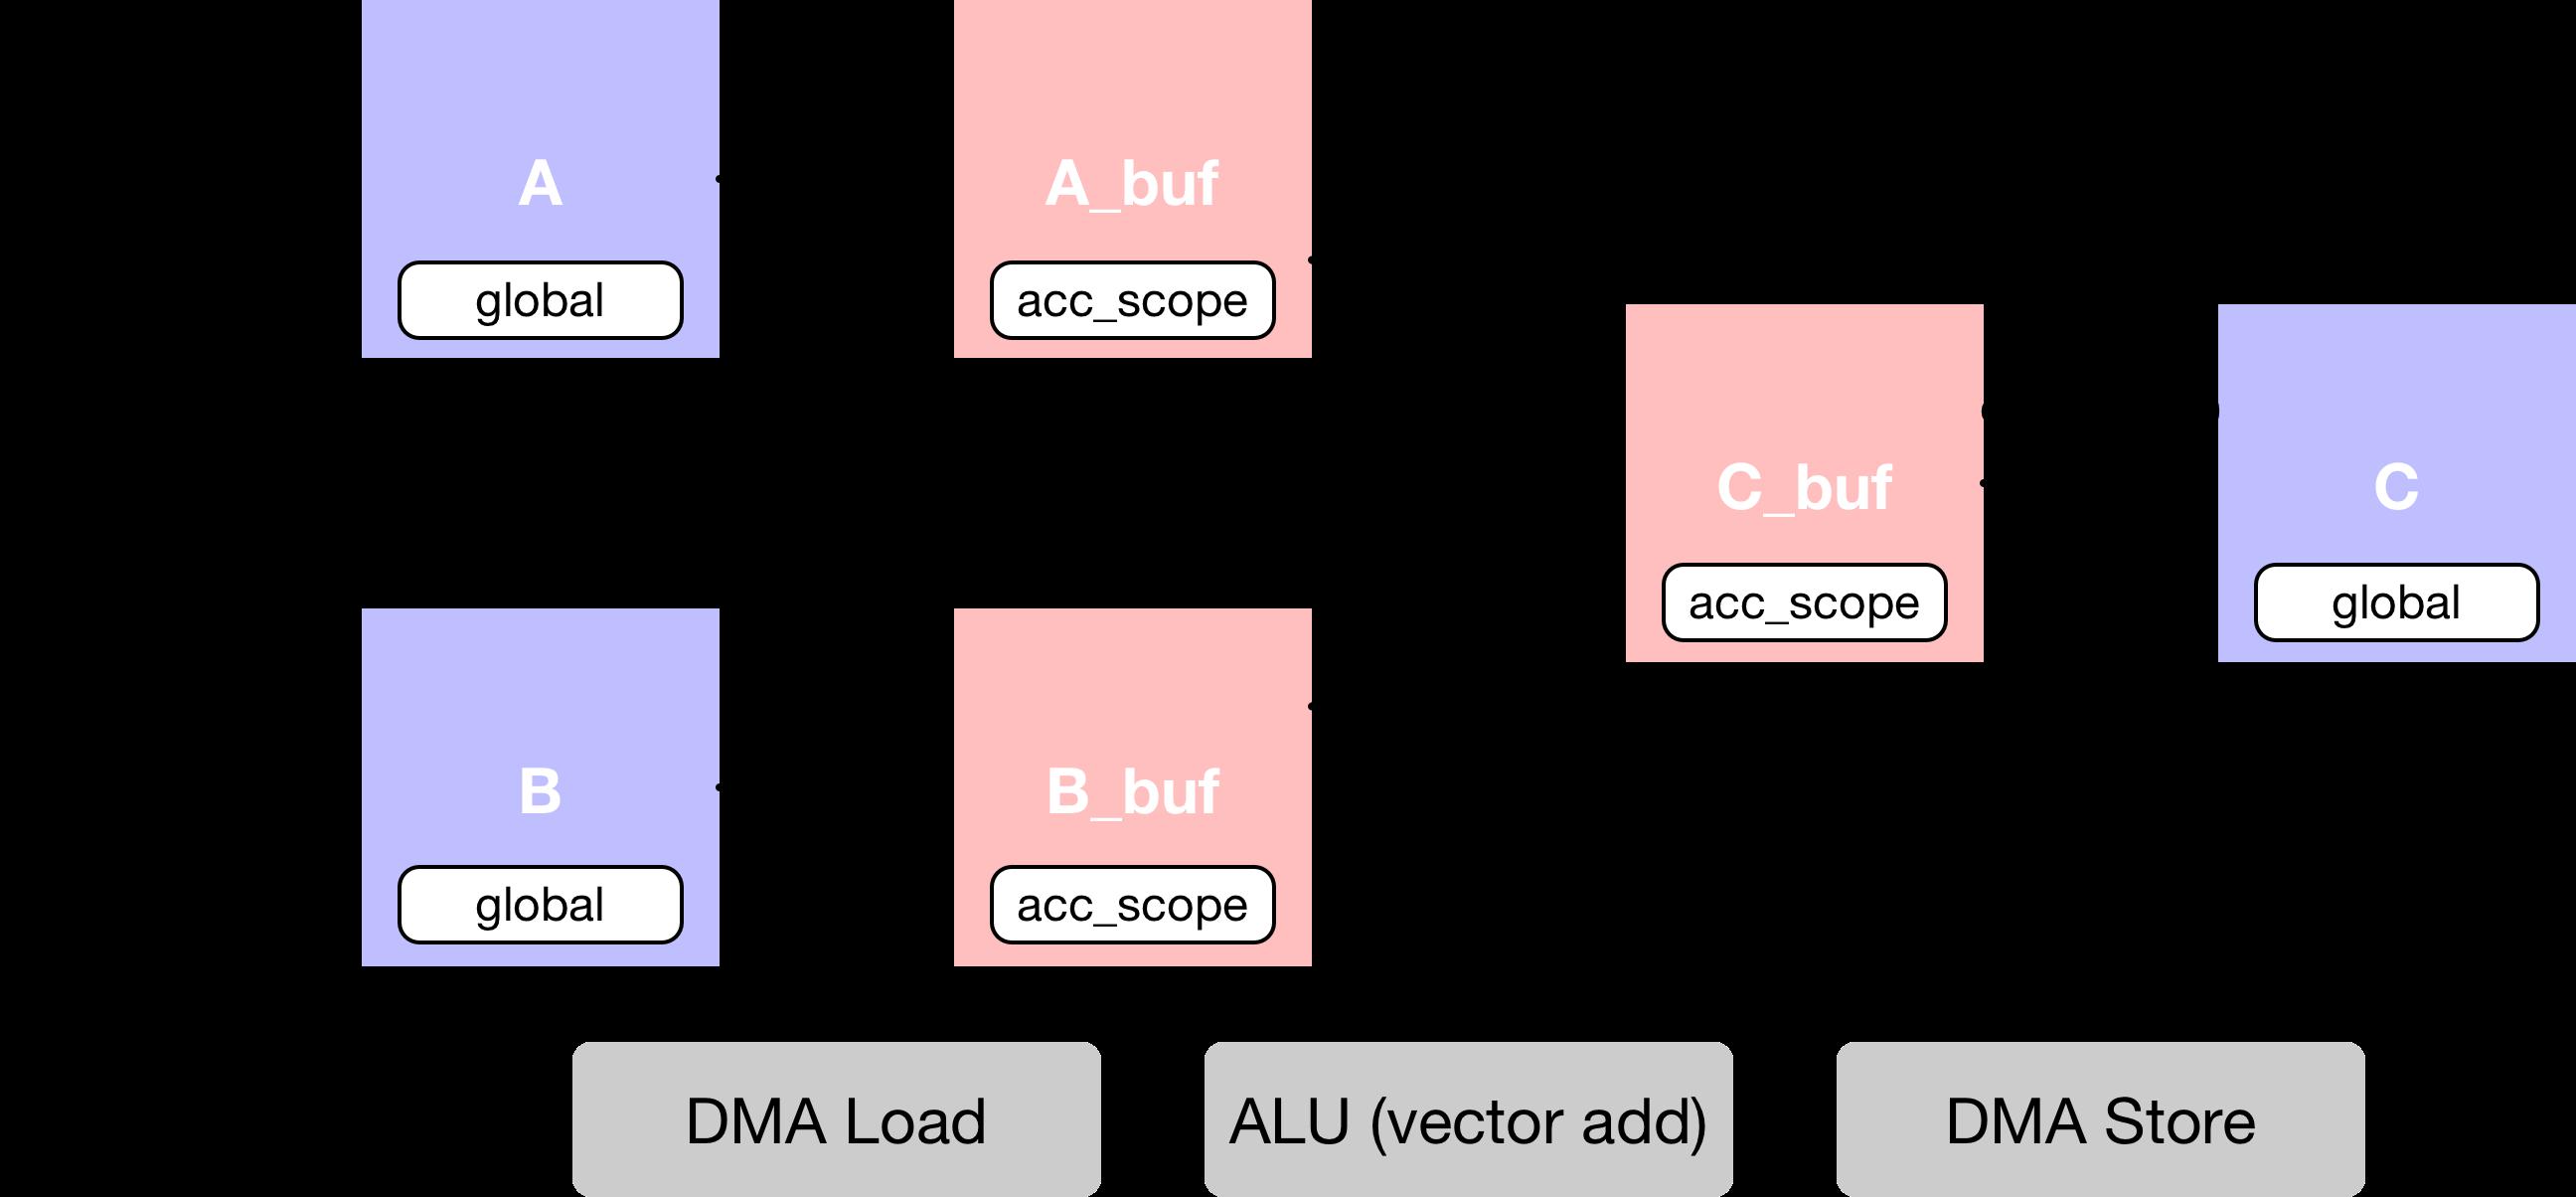 https://raw.githubusercontent.com/uwsaml/web-data/master/vta/tutorial/vadd_dataflow.png